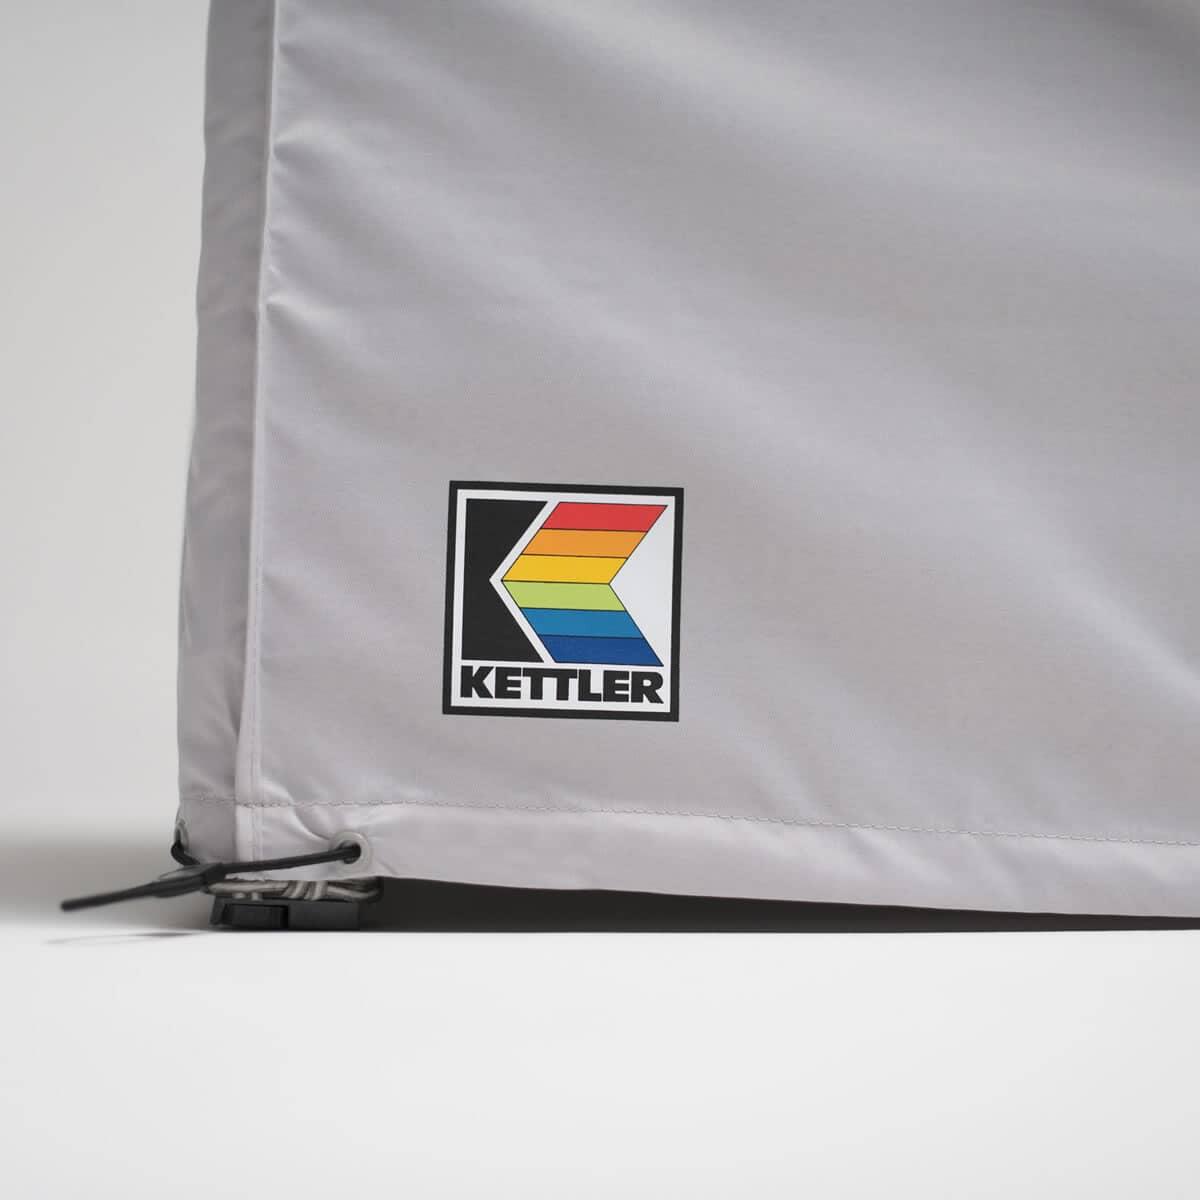 Kettler Night Cover For Palma Mini Table 0103337 Pt